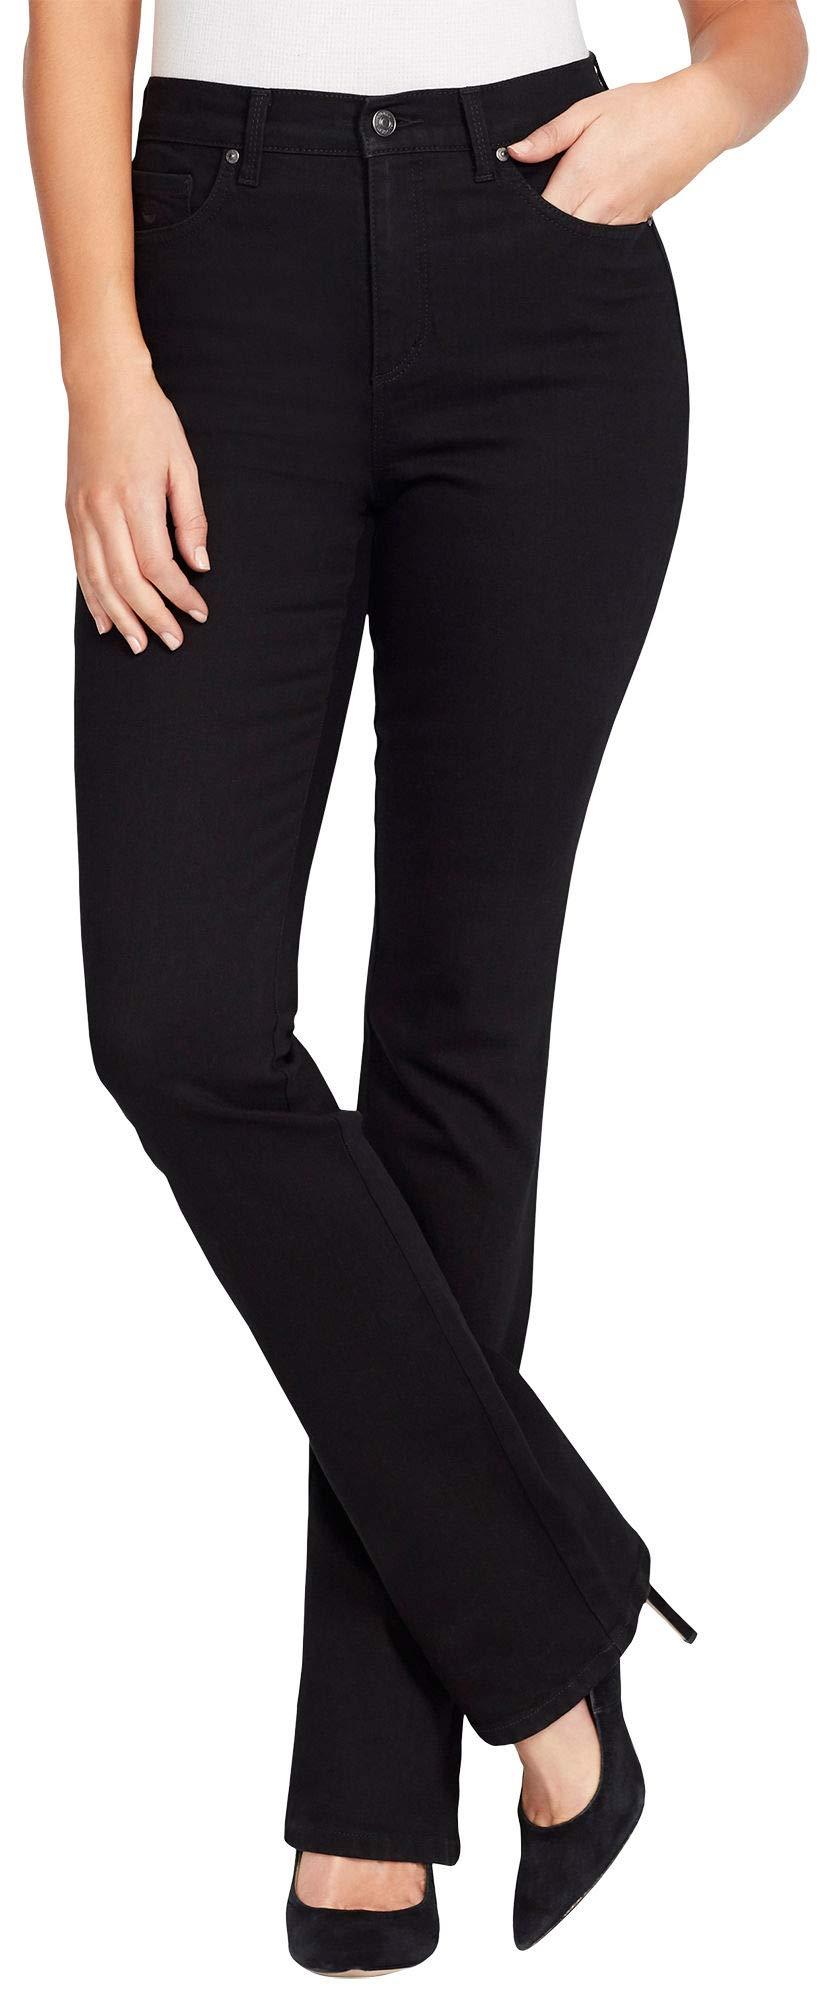 Gloria Vanderbilt Petite Amanda Boot Cut Jeans 16P Black